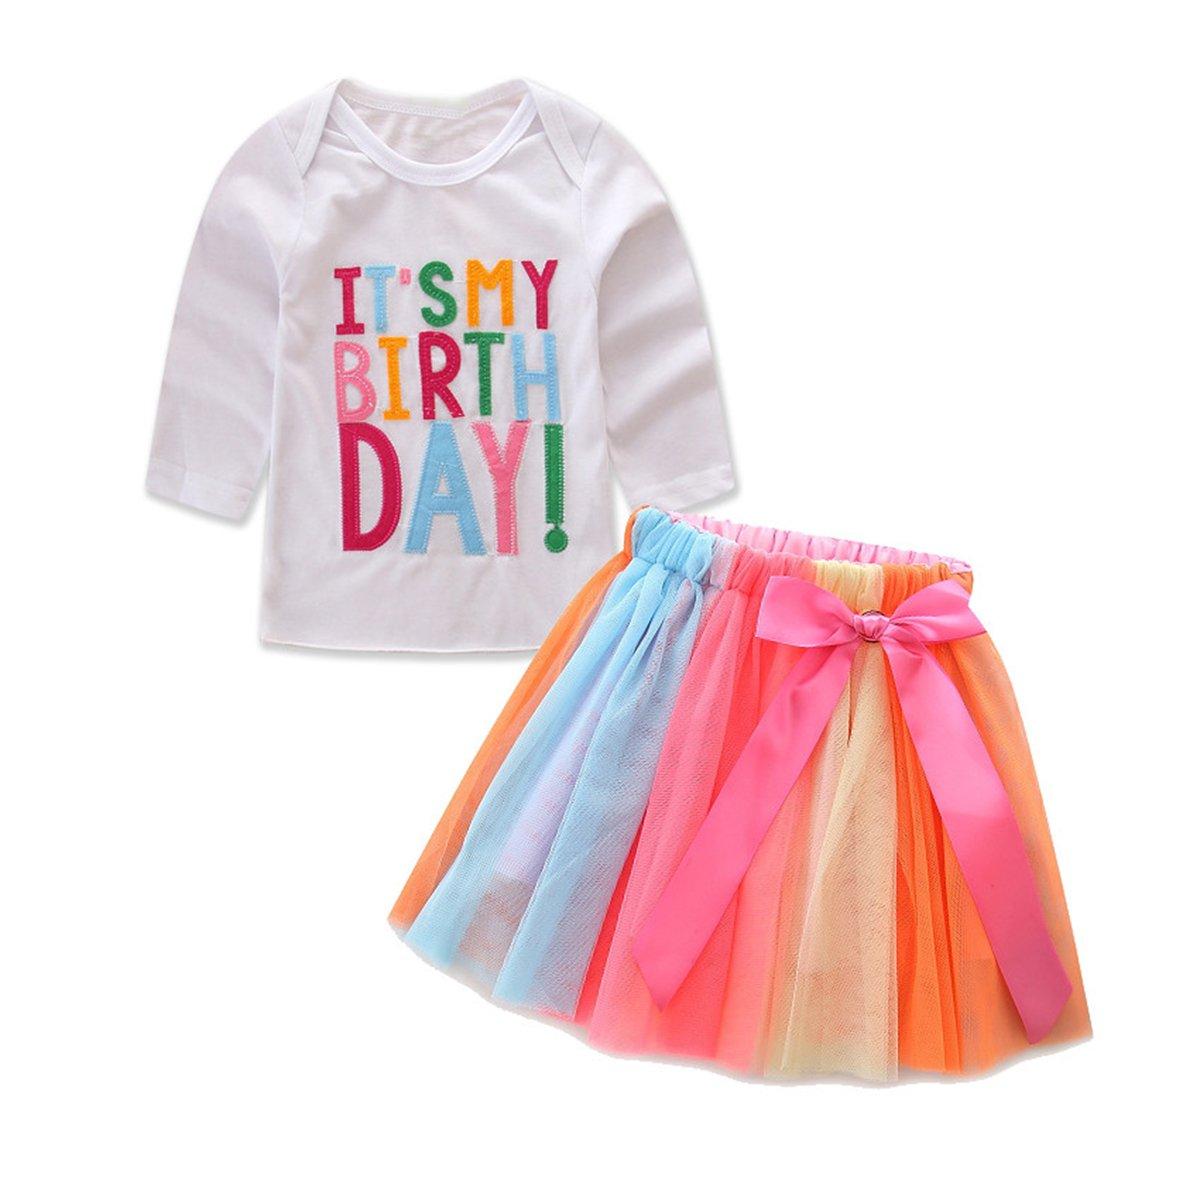 1-6T Toddler Baby Girls Birthday Outfit Set Birthday Shirt + Rainbow Tutu Skirt